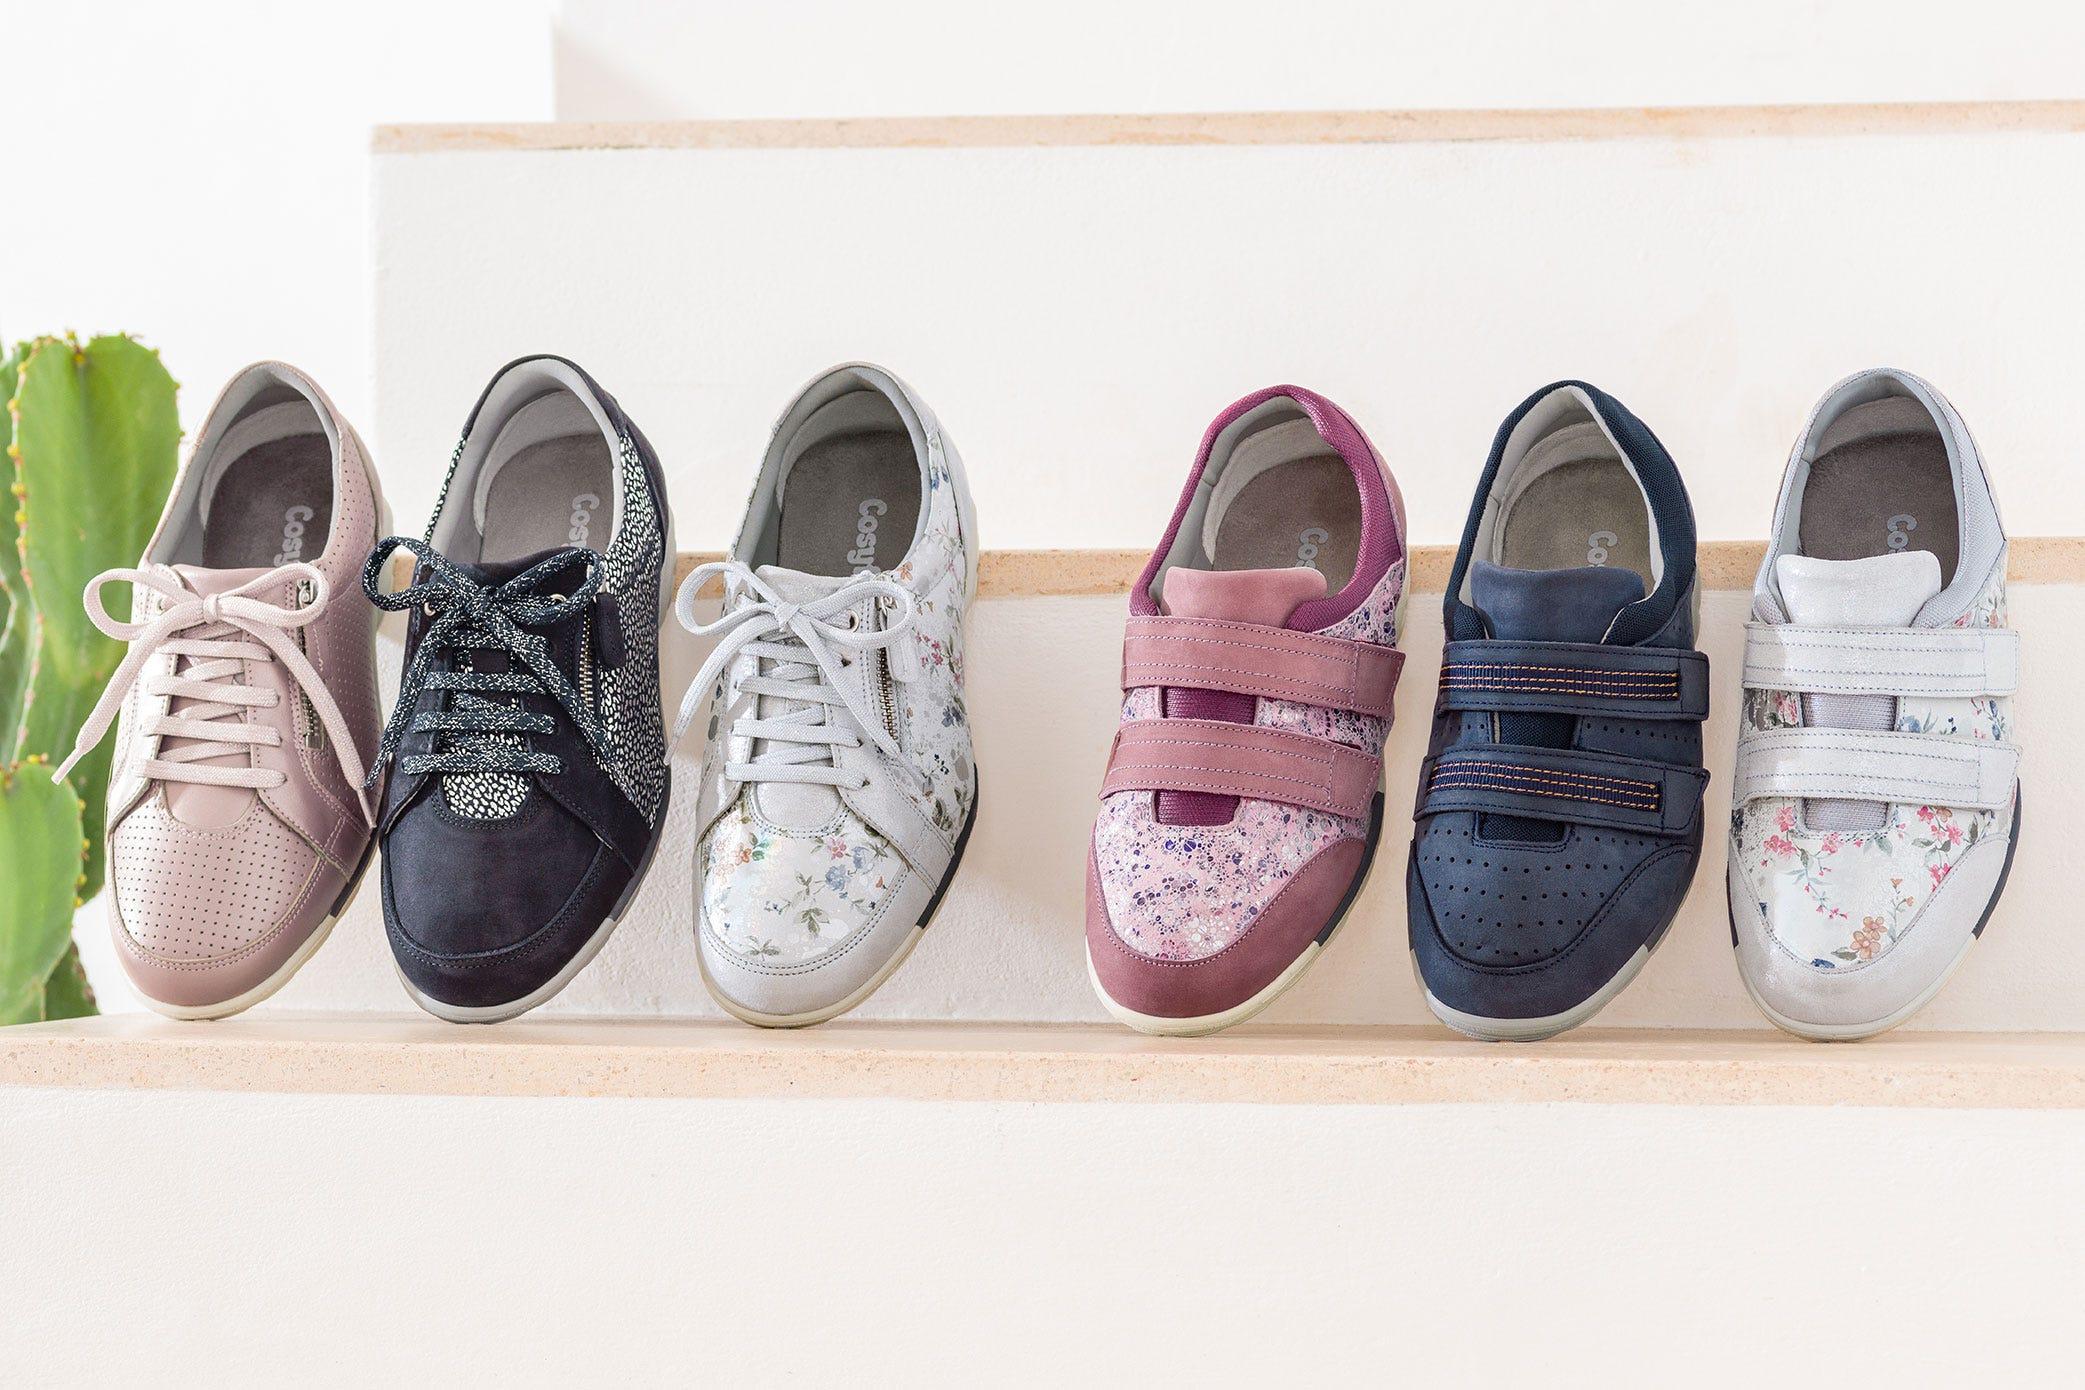 Cushion Active™ footwear